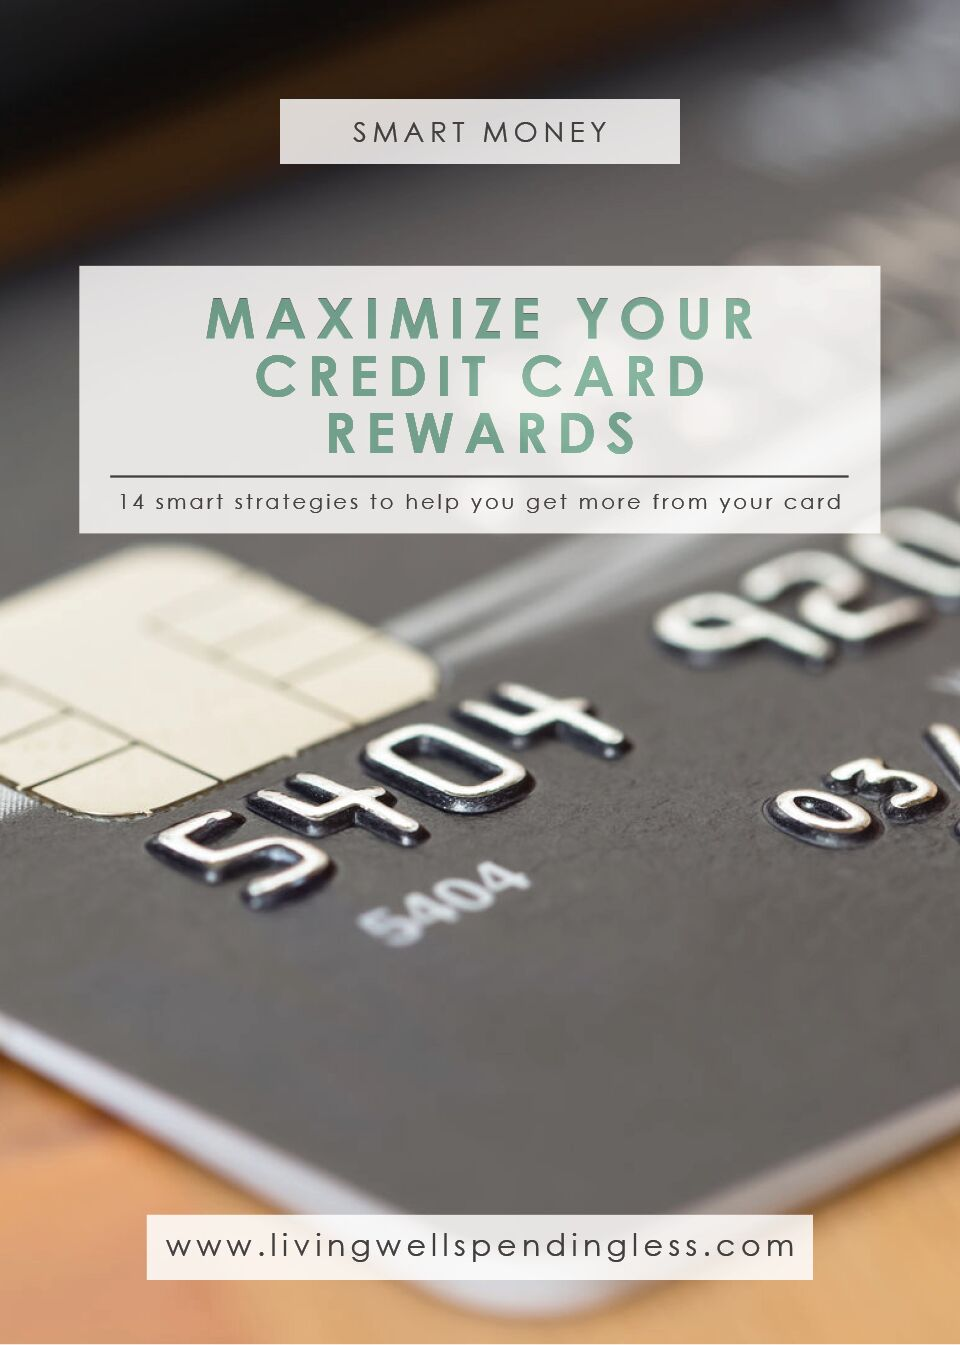 Maxmize Your Credit Card Rewards | Budgeting | Money Saving Tips | Smart Money